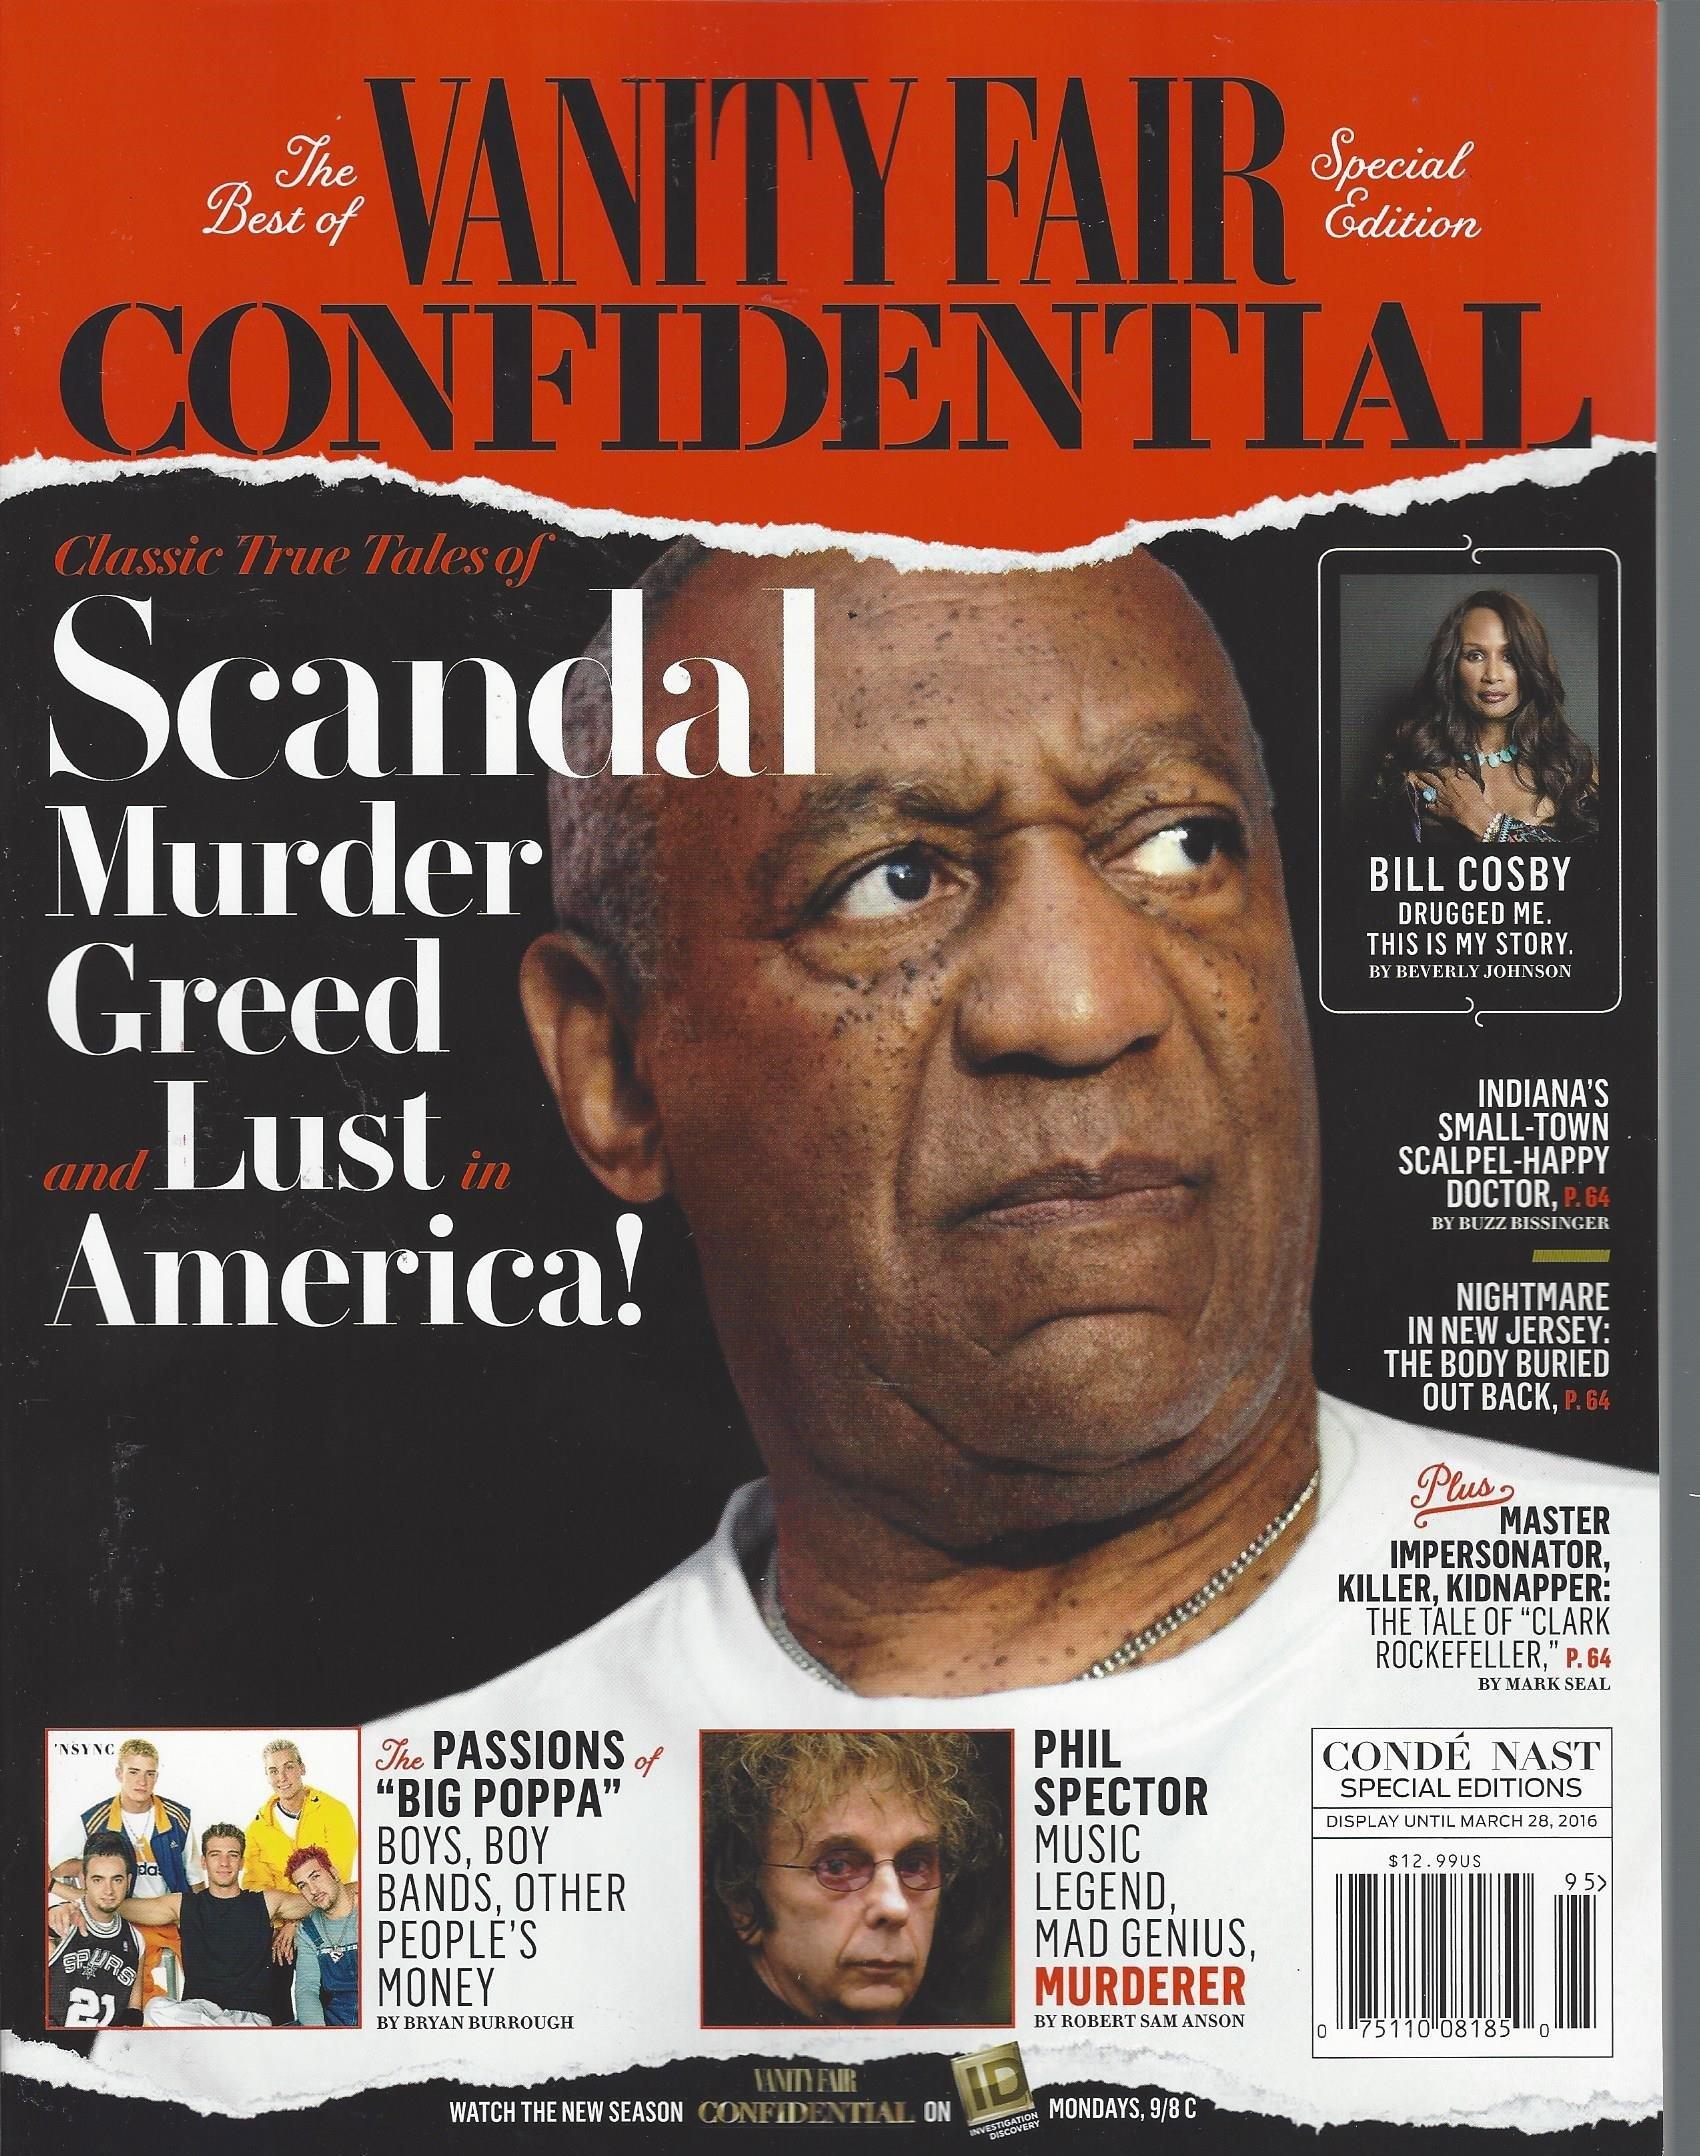 VANITY FAIR CONFIDENTIAL SCANDAL MURDER GREED LUST IN AMERICA [Single Issue Magazine] 2016 ebook